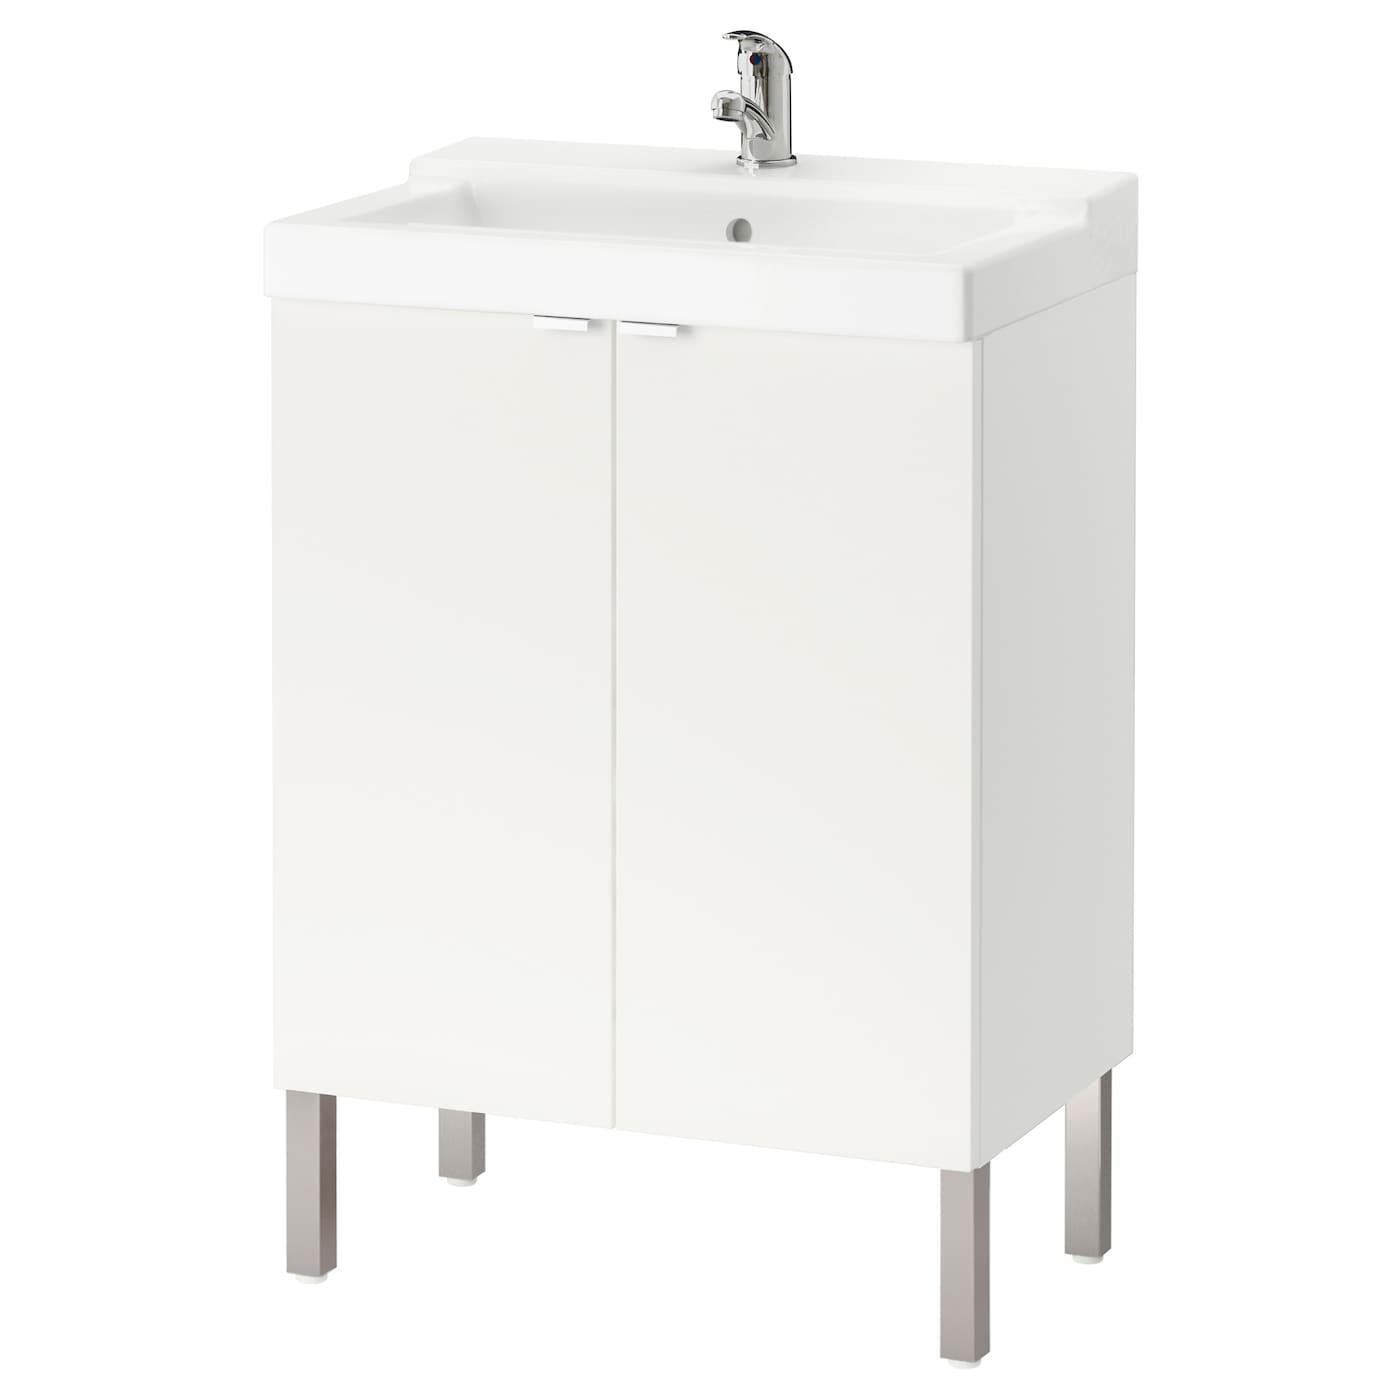 Vanity Units - Sink Cabinets & Wash Stands | IKEA